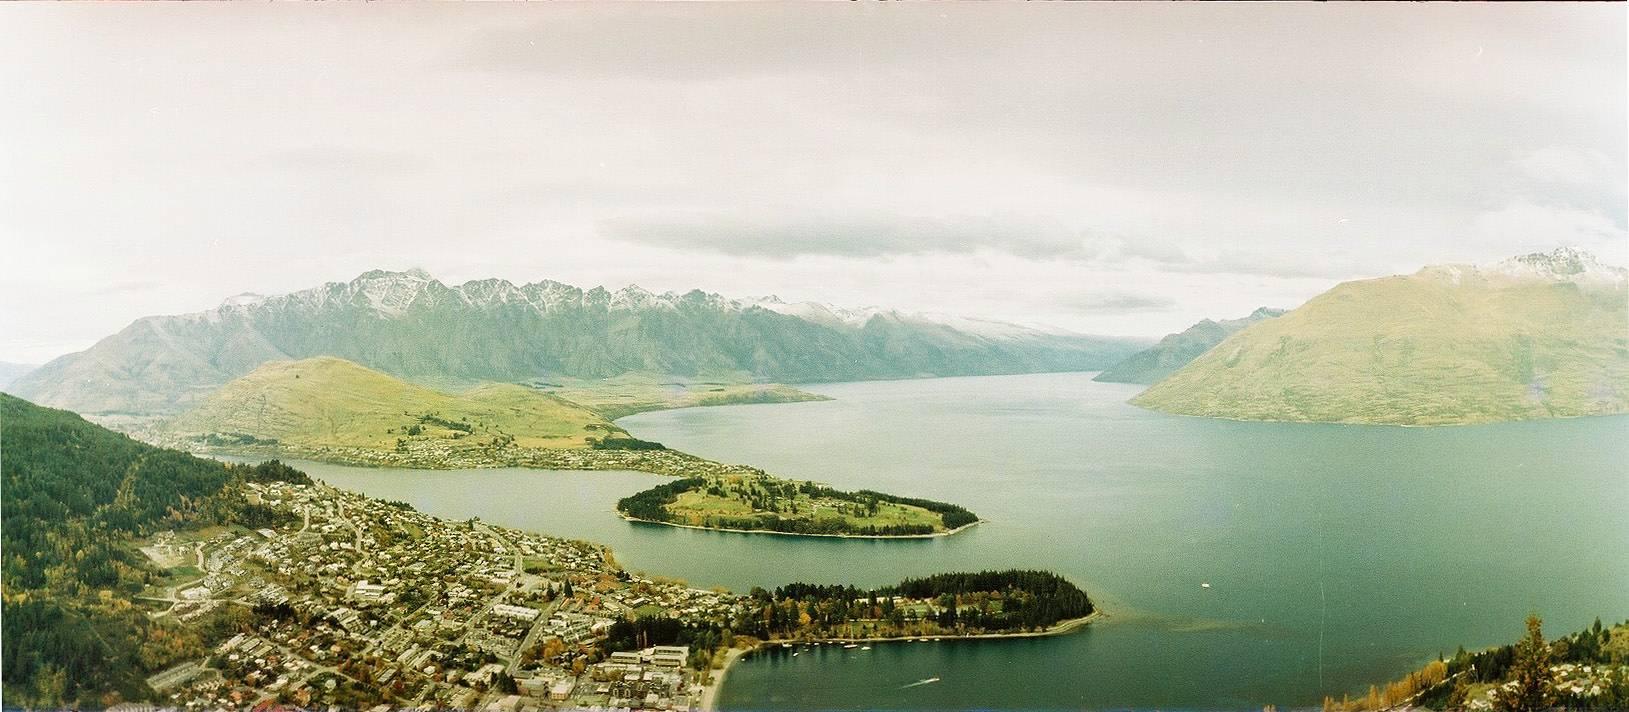 Wanaka - Nova Zelândia Express